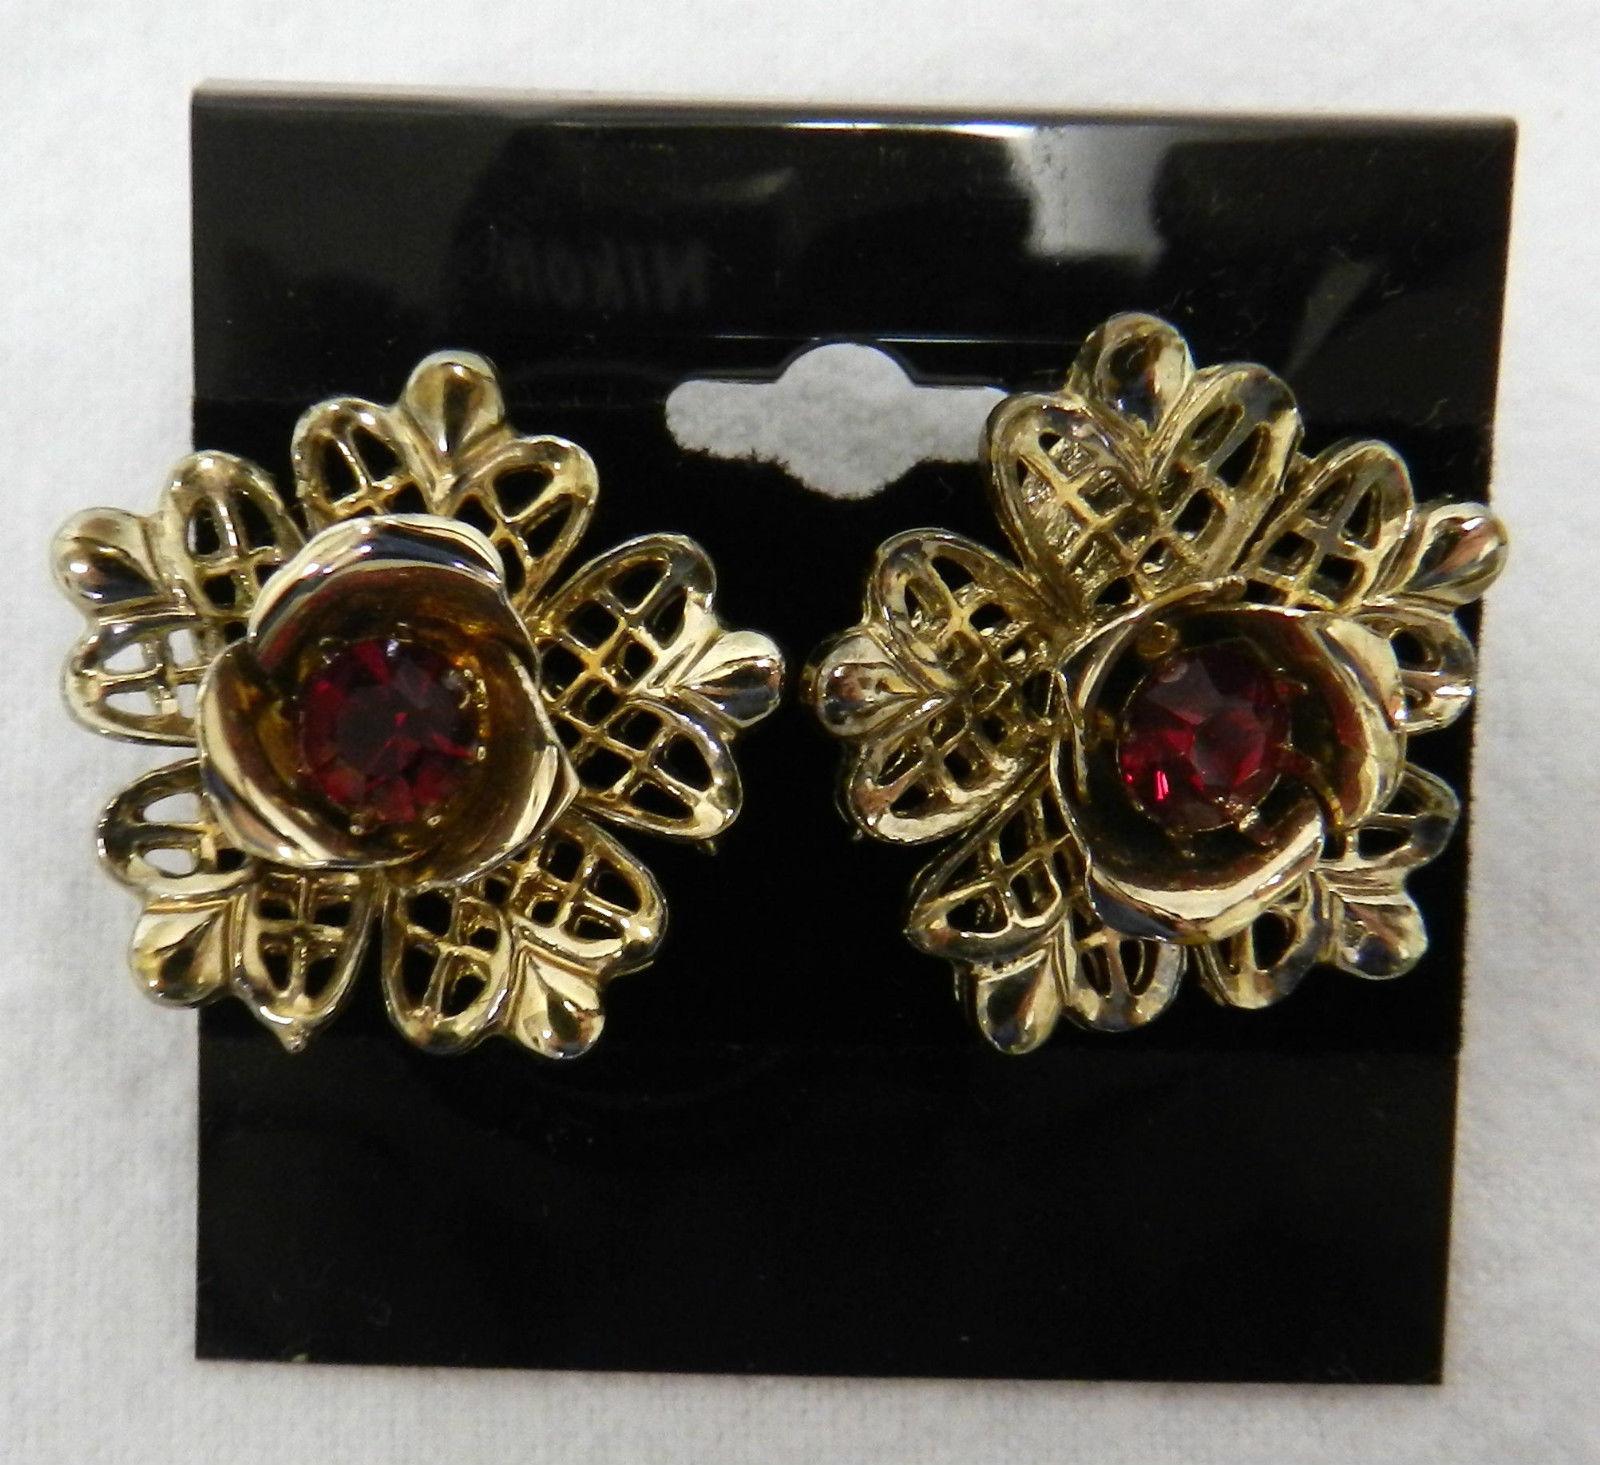 40fc0881b t2ec16vhjhye9nzpec4zbrsi 5fzbq 60 57. t2ec16vhjhye9nzpec4zbrsi 5fzbq 60 57.  Previous. Coro Ruby Red Stone Gold Tone Floral Flower Screw Back Clip  Earrings ...